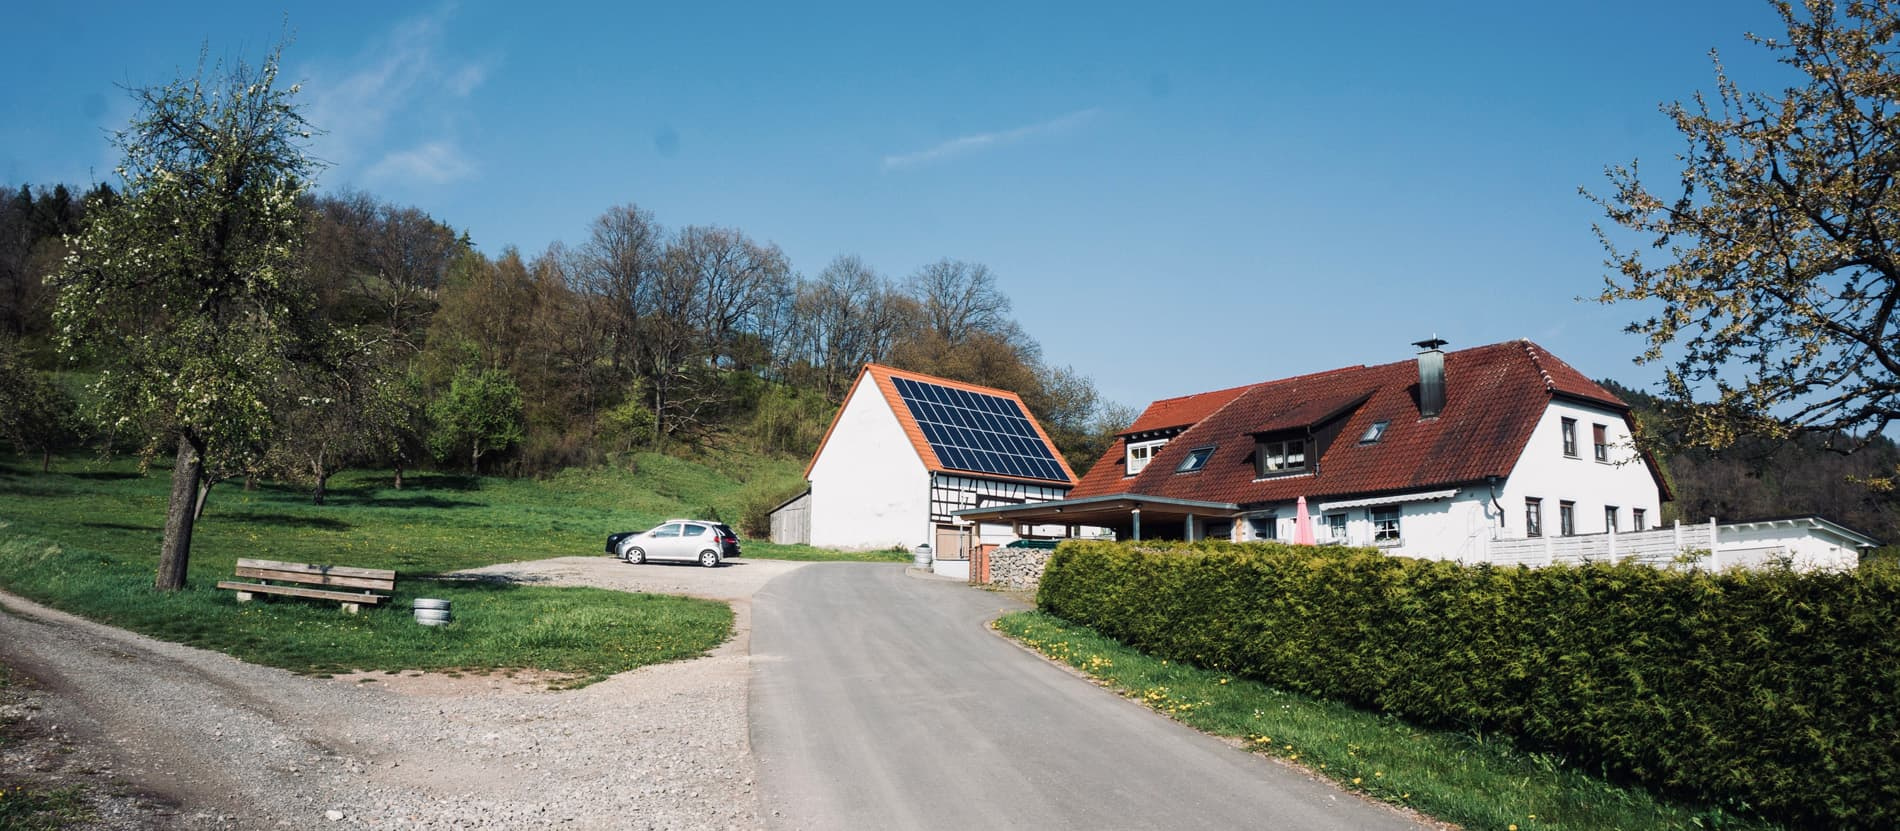 gaestehaus-juhl-rangendingen